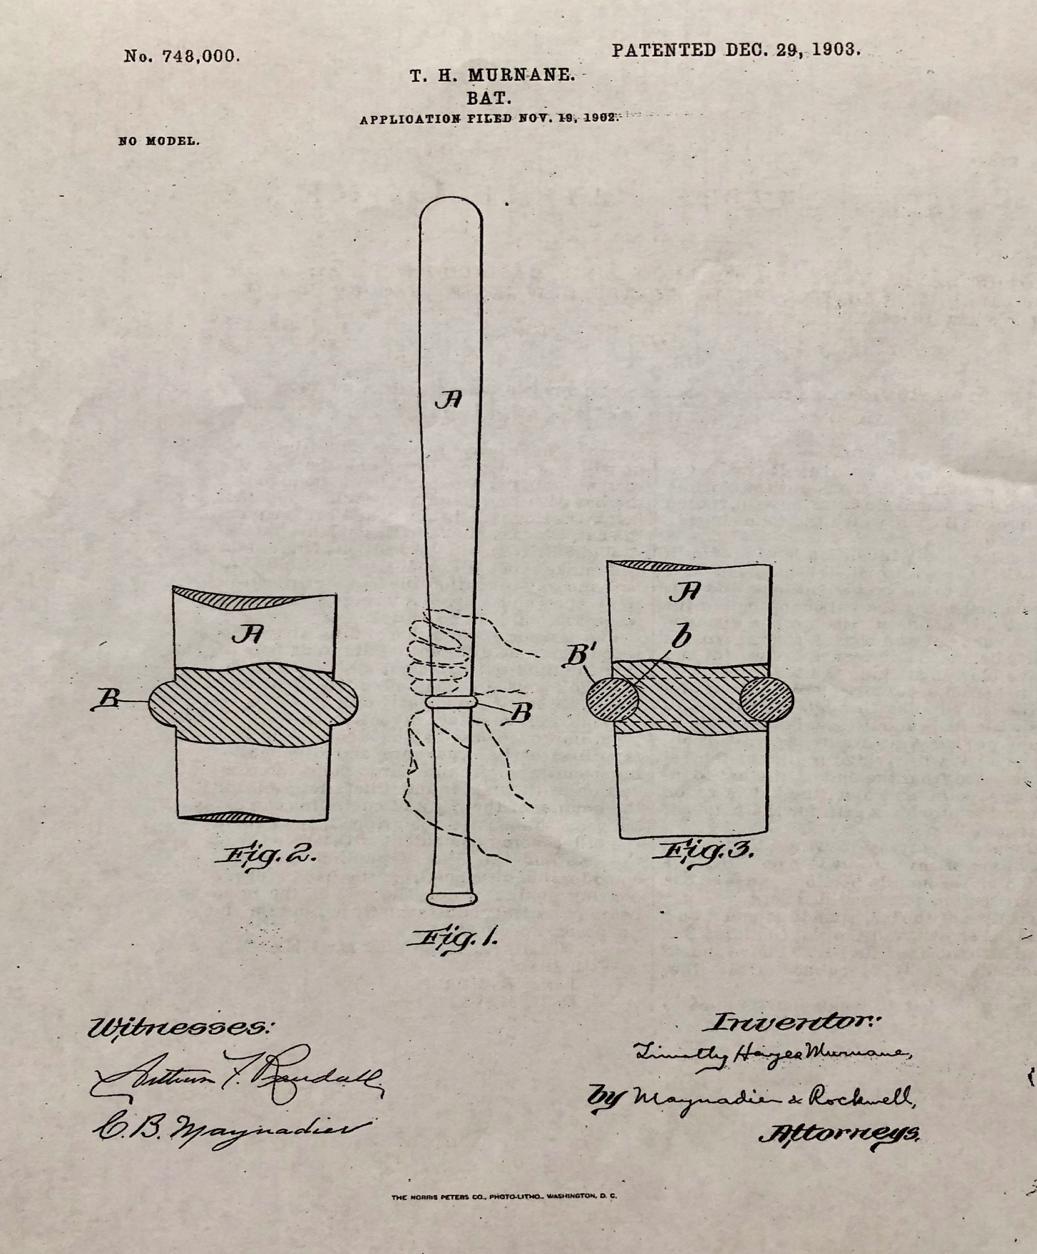 Tim Murnane baseball bat patent